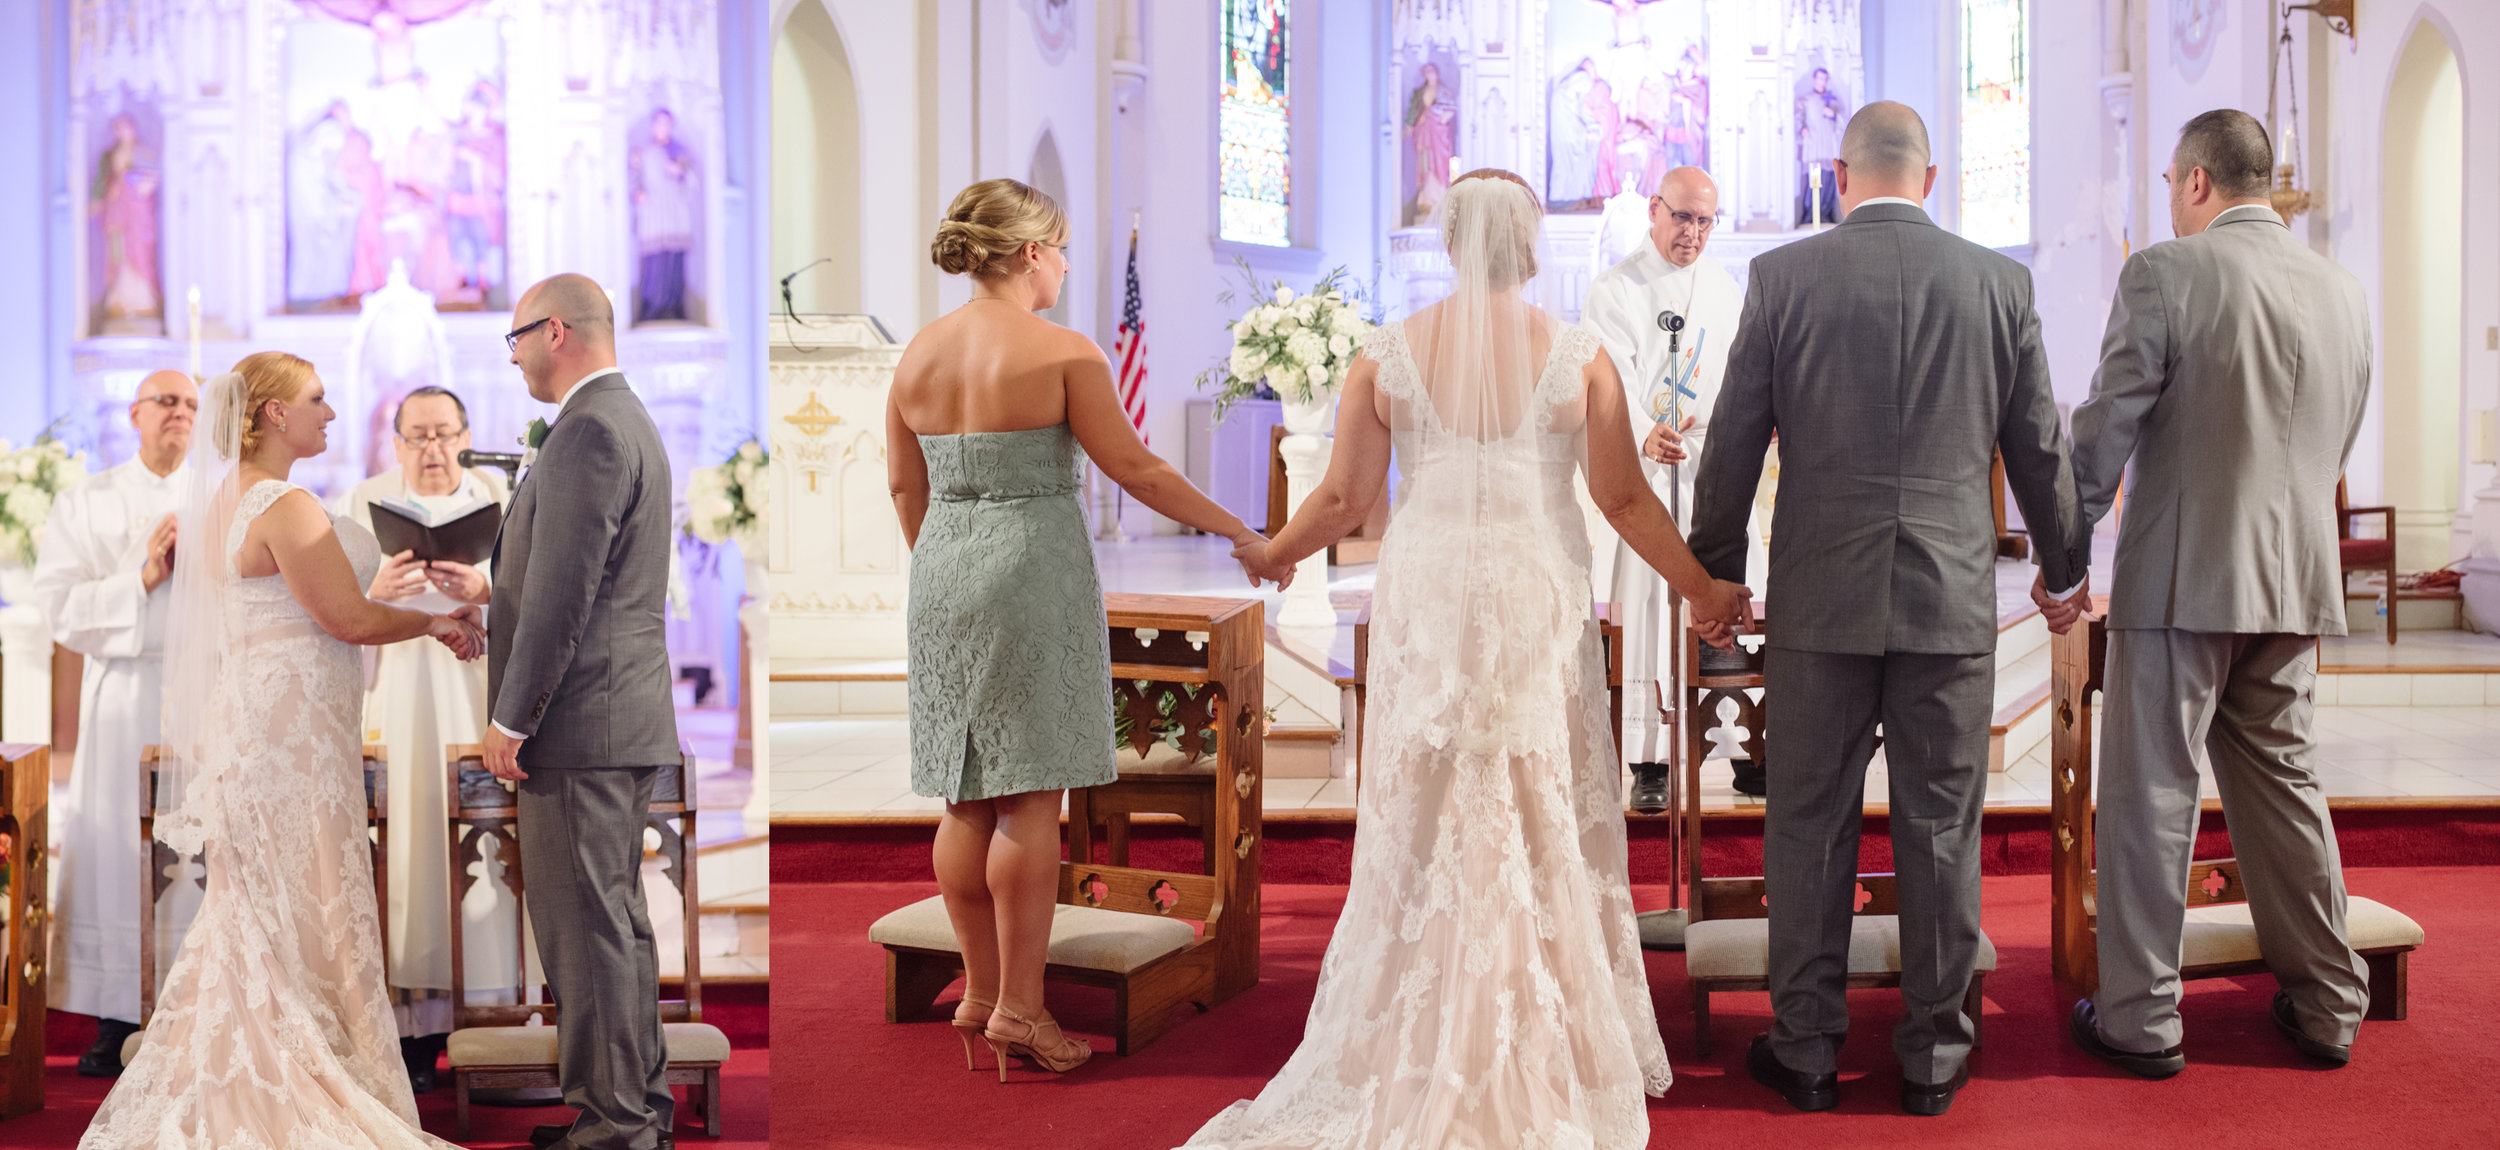 wedding ceremony mariah fisher photography.jpg